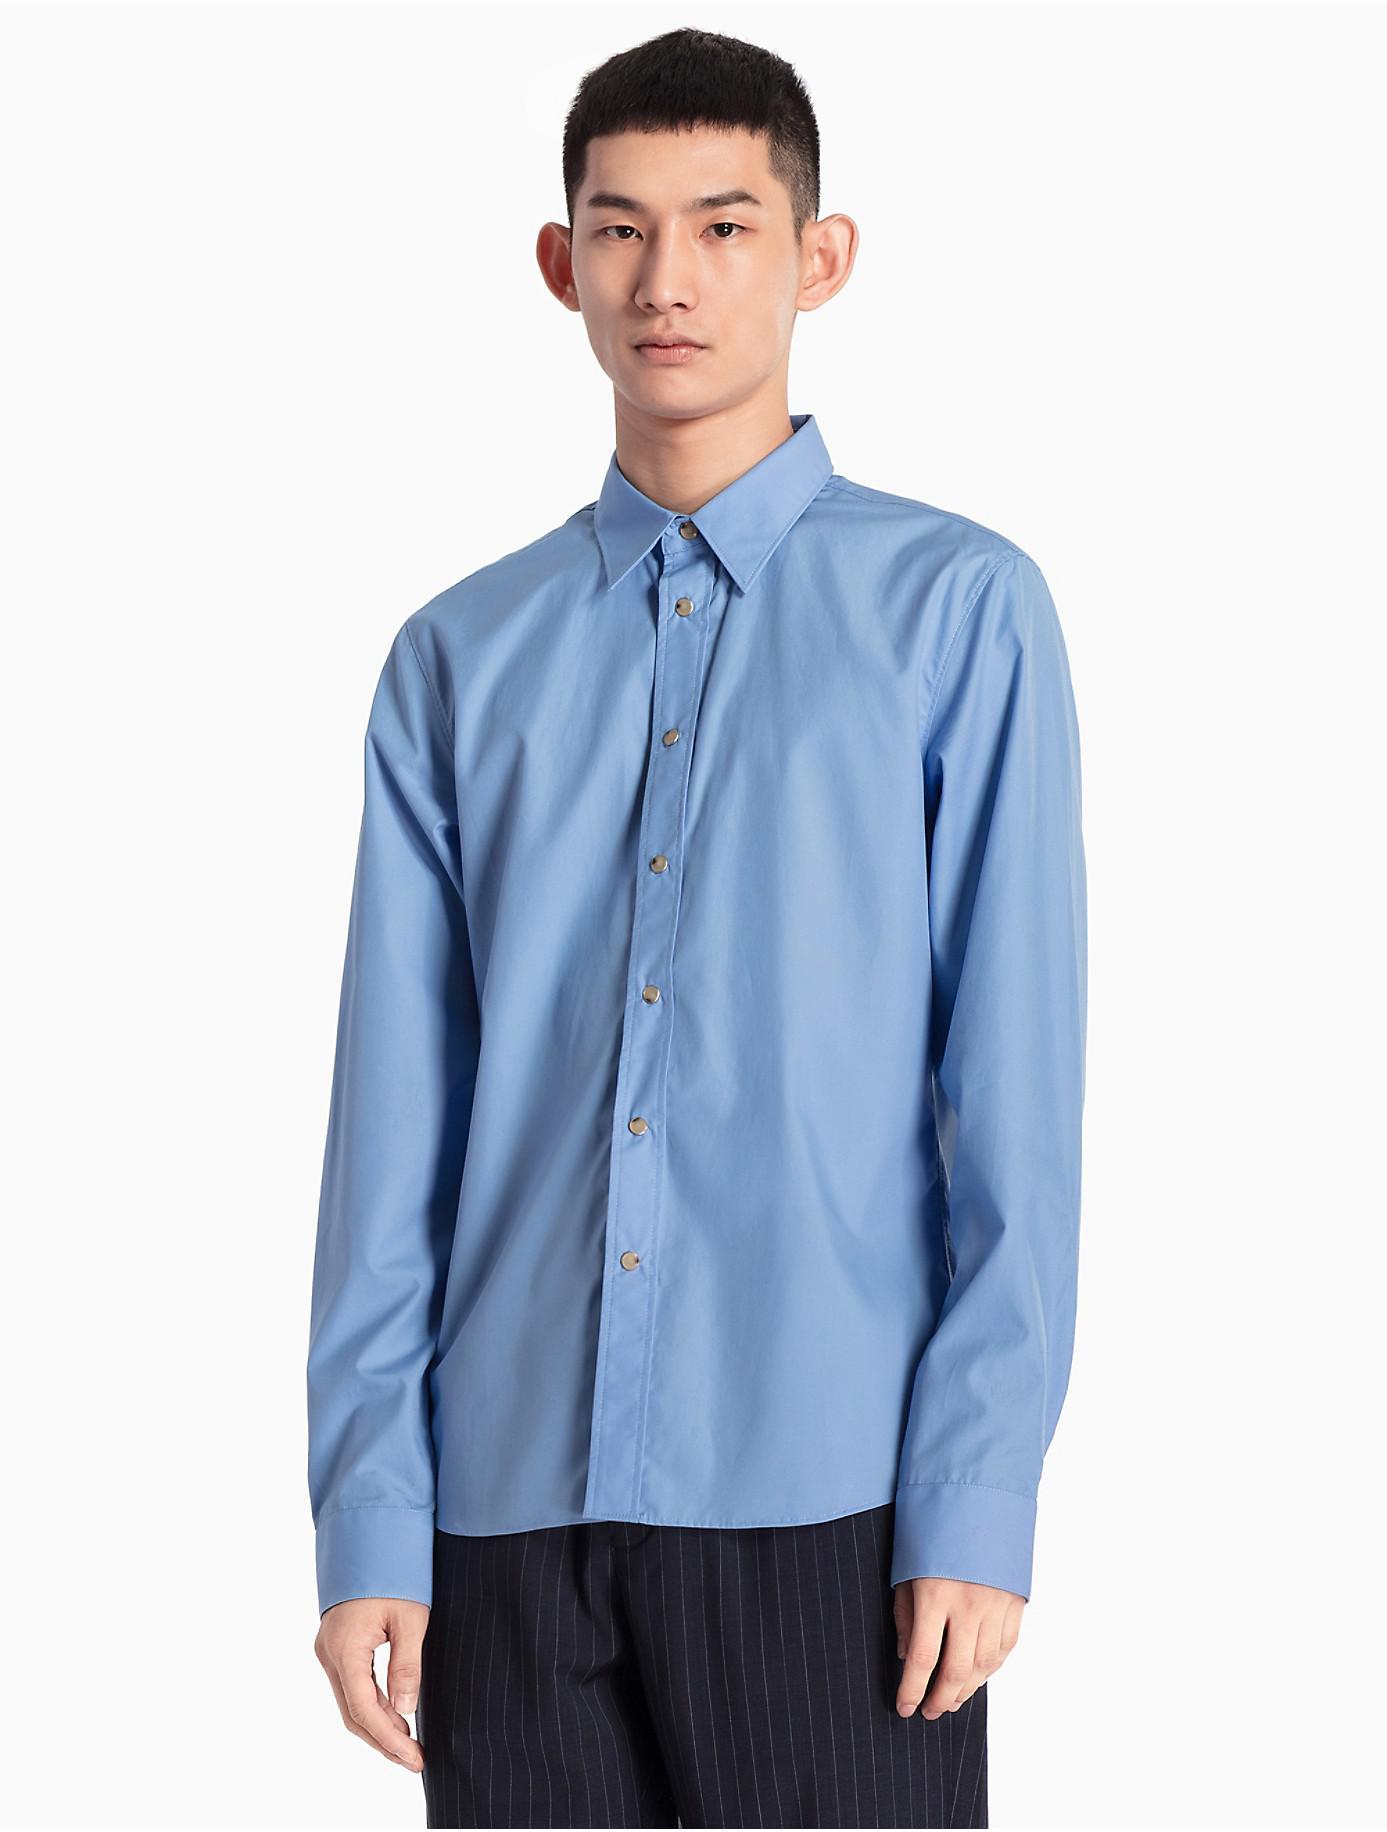 f35dd0a9a93 Lyst - Calvin Klein Slim Fit Snap Dress Shirt in Blue for Men